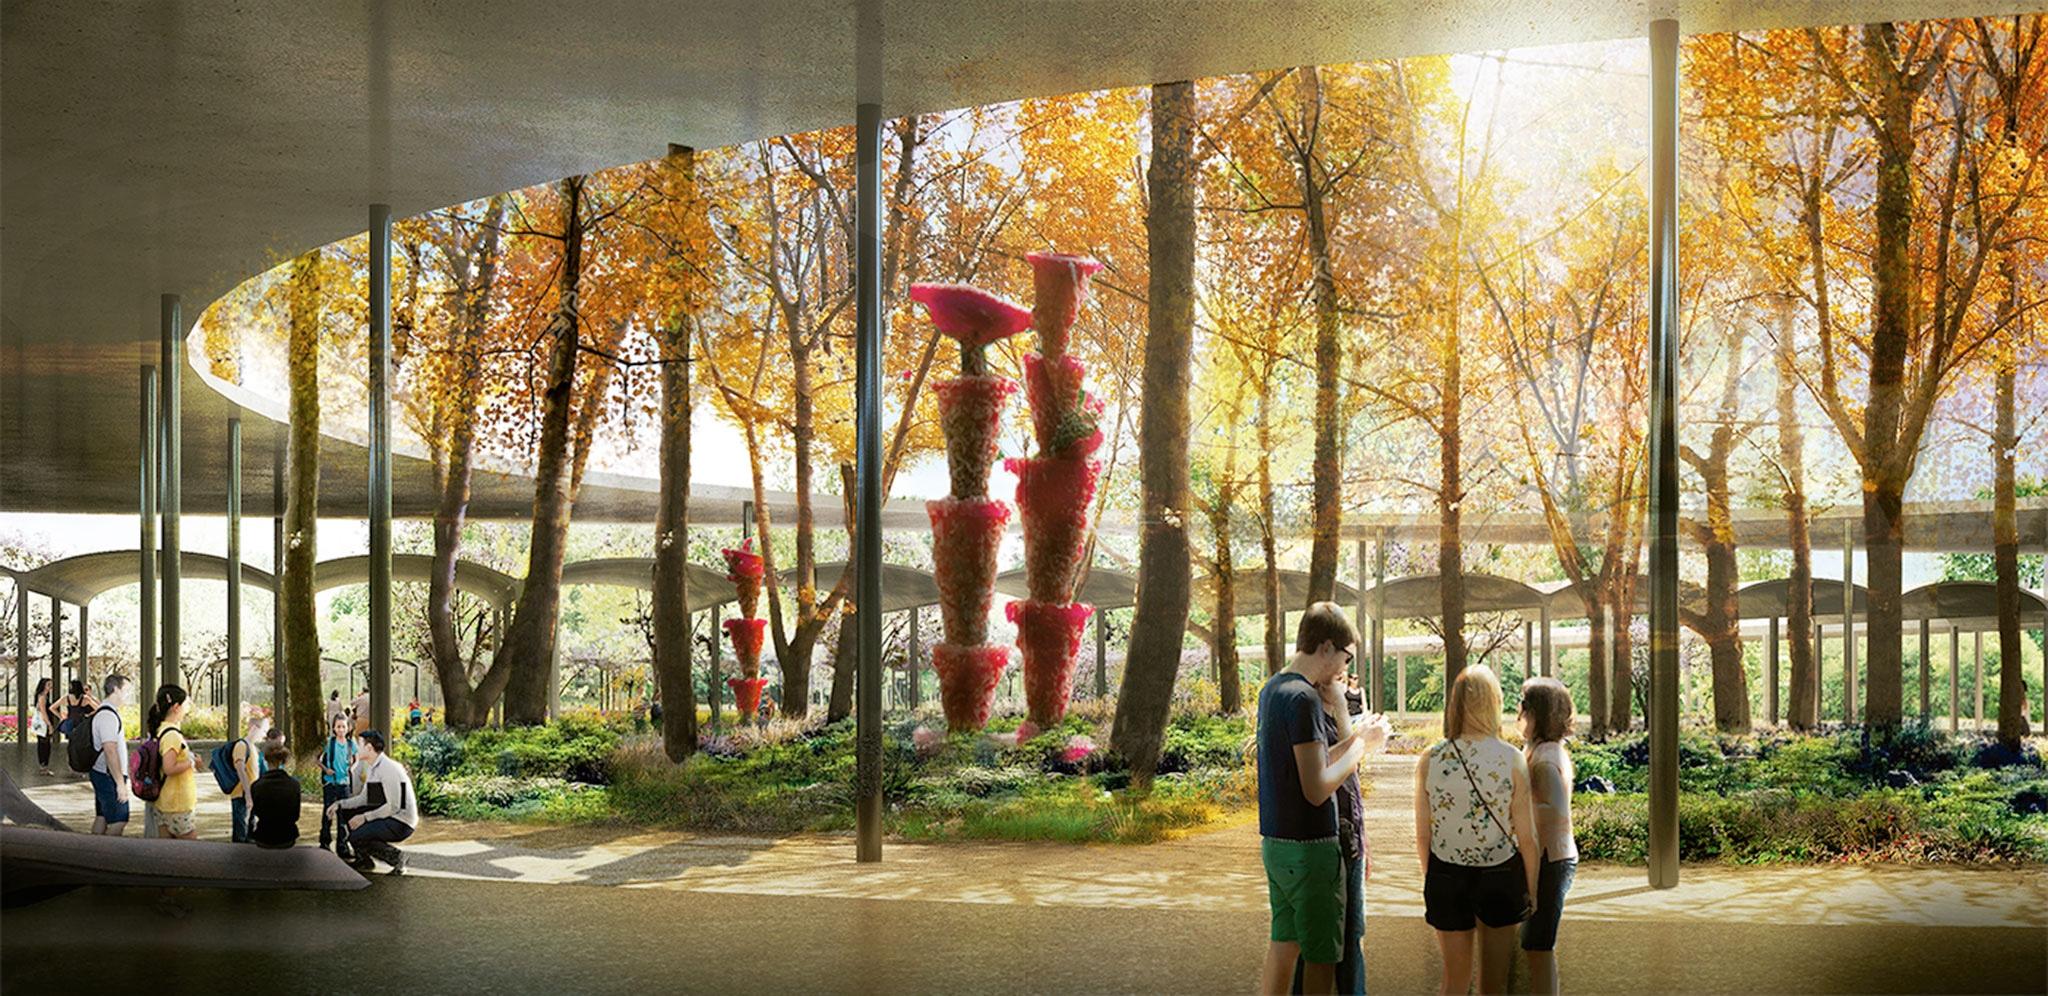 Approved Houston Botanic Garden master plan design by West 8 | METALOCUS